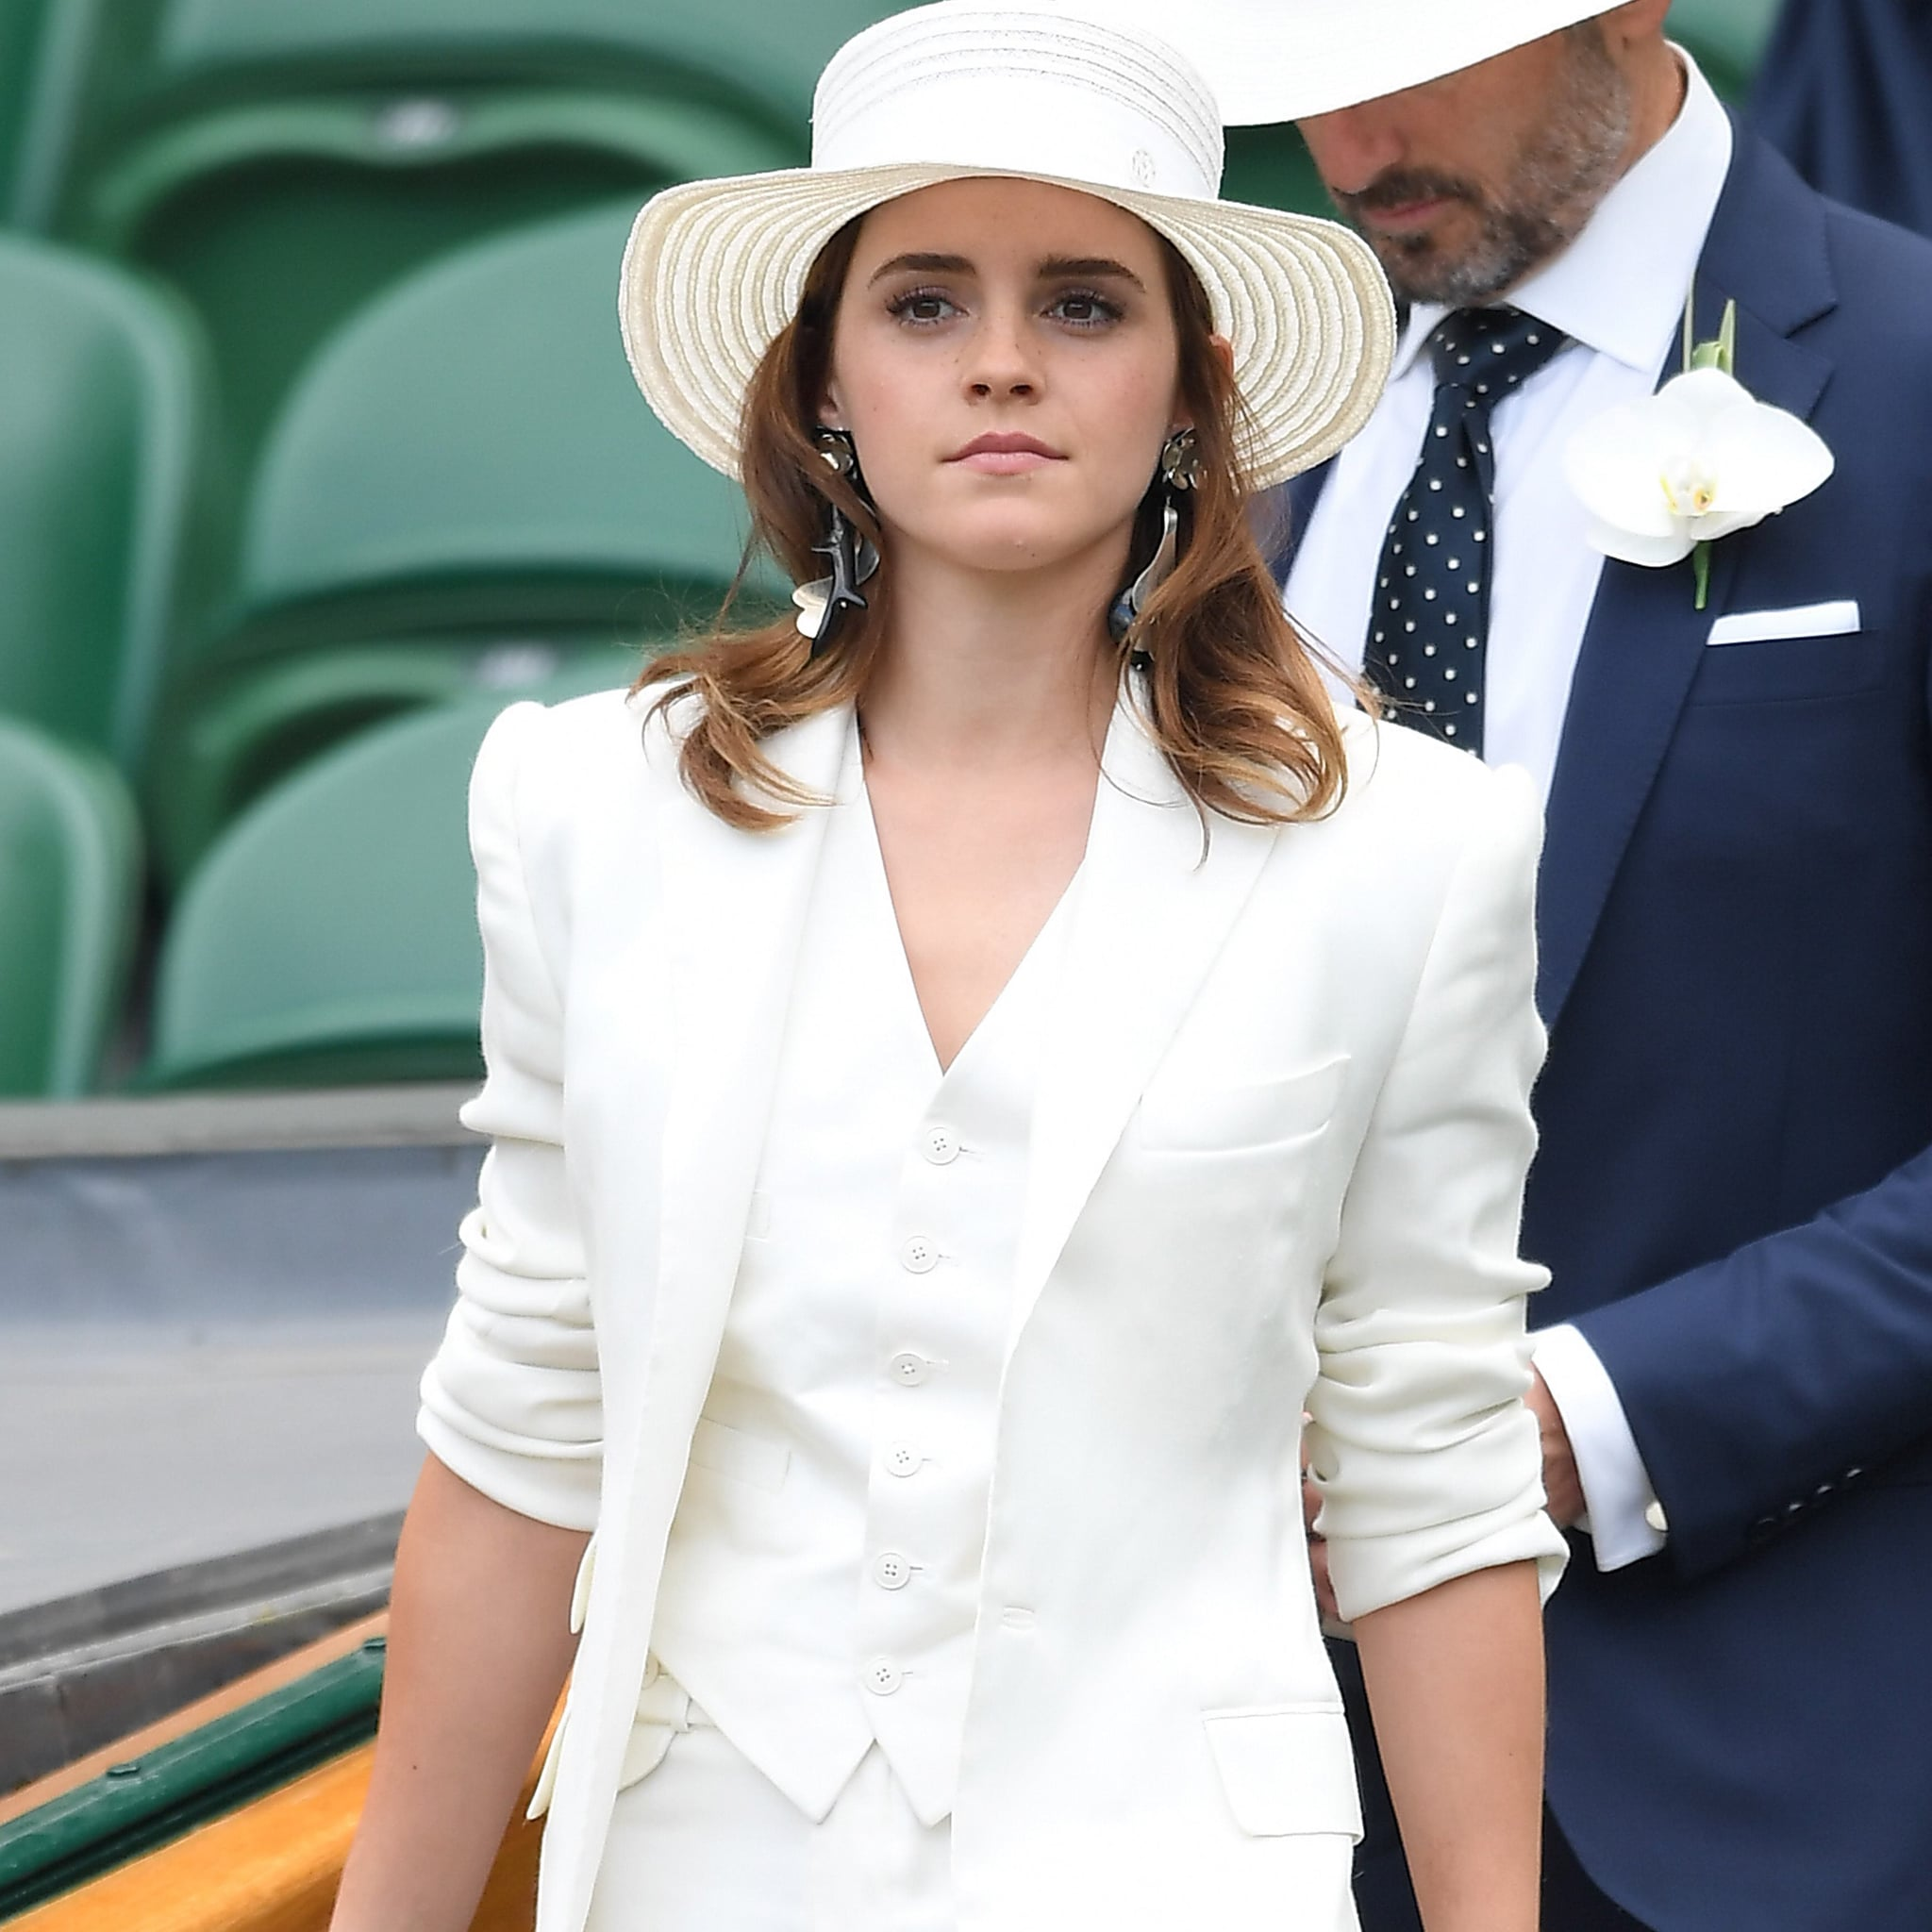 emma watson ralph lauren wimbledon outfit 2018 | popsugar fashion